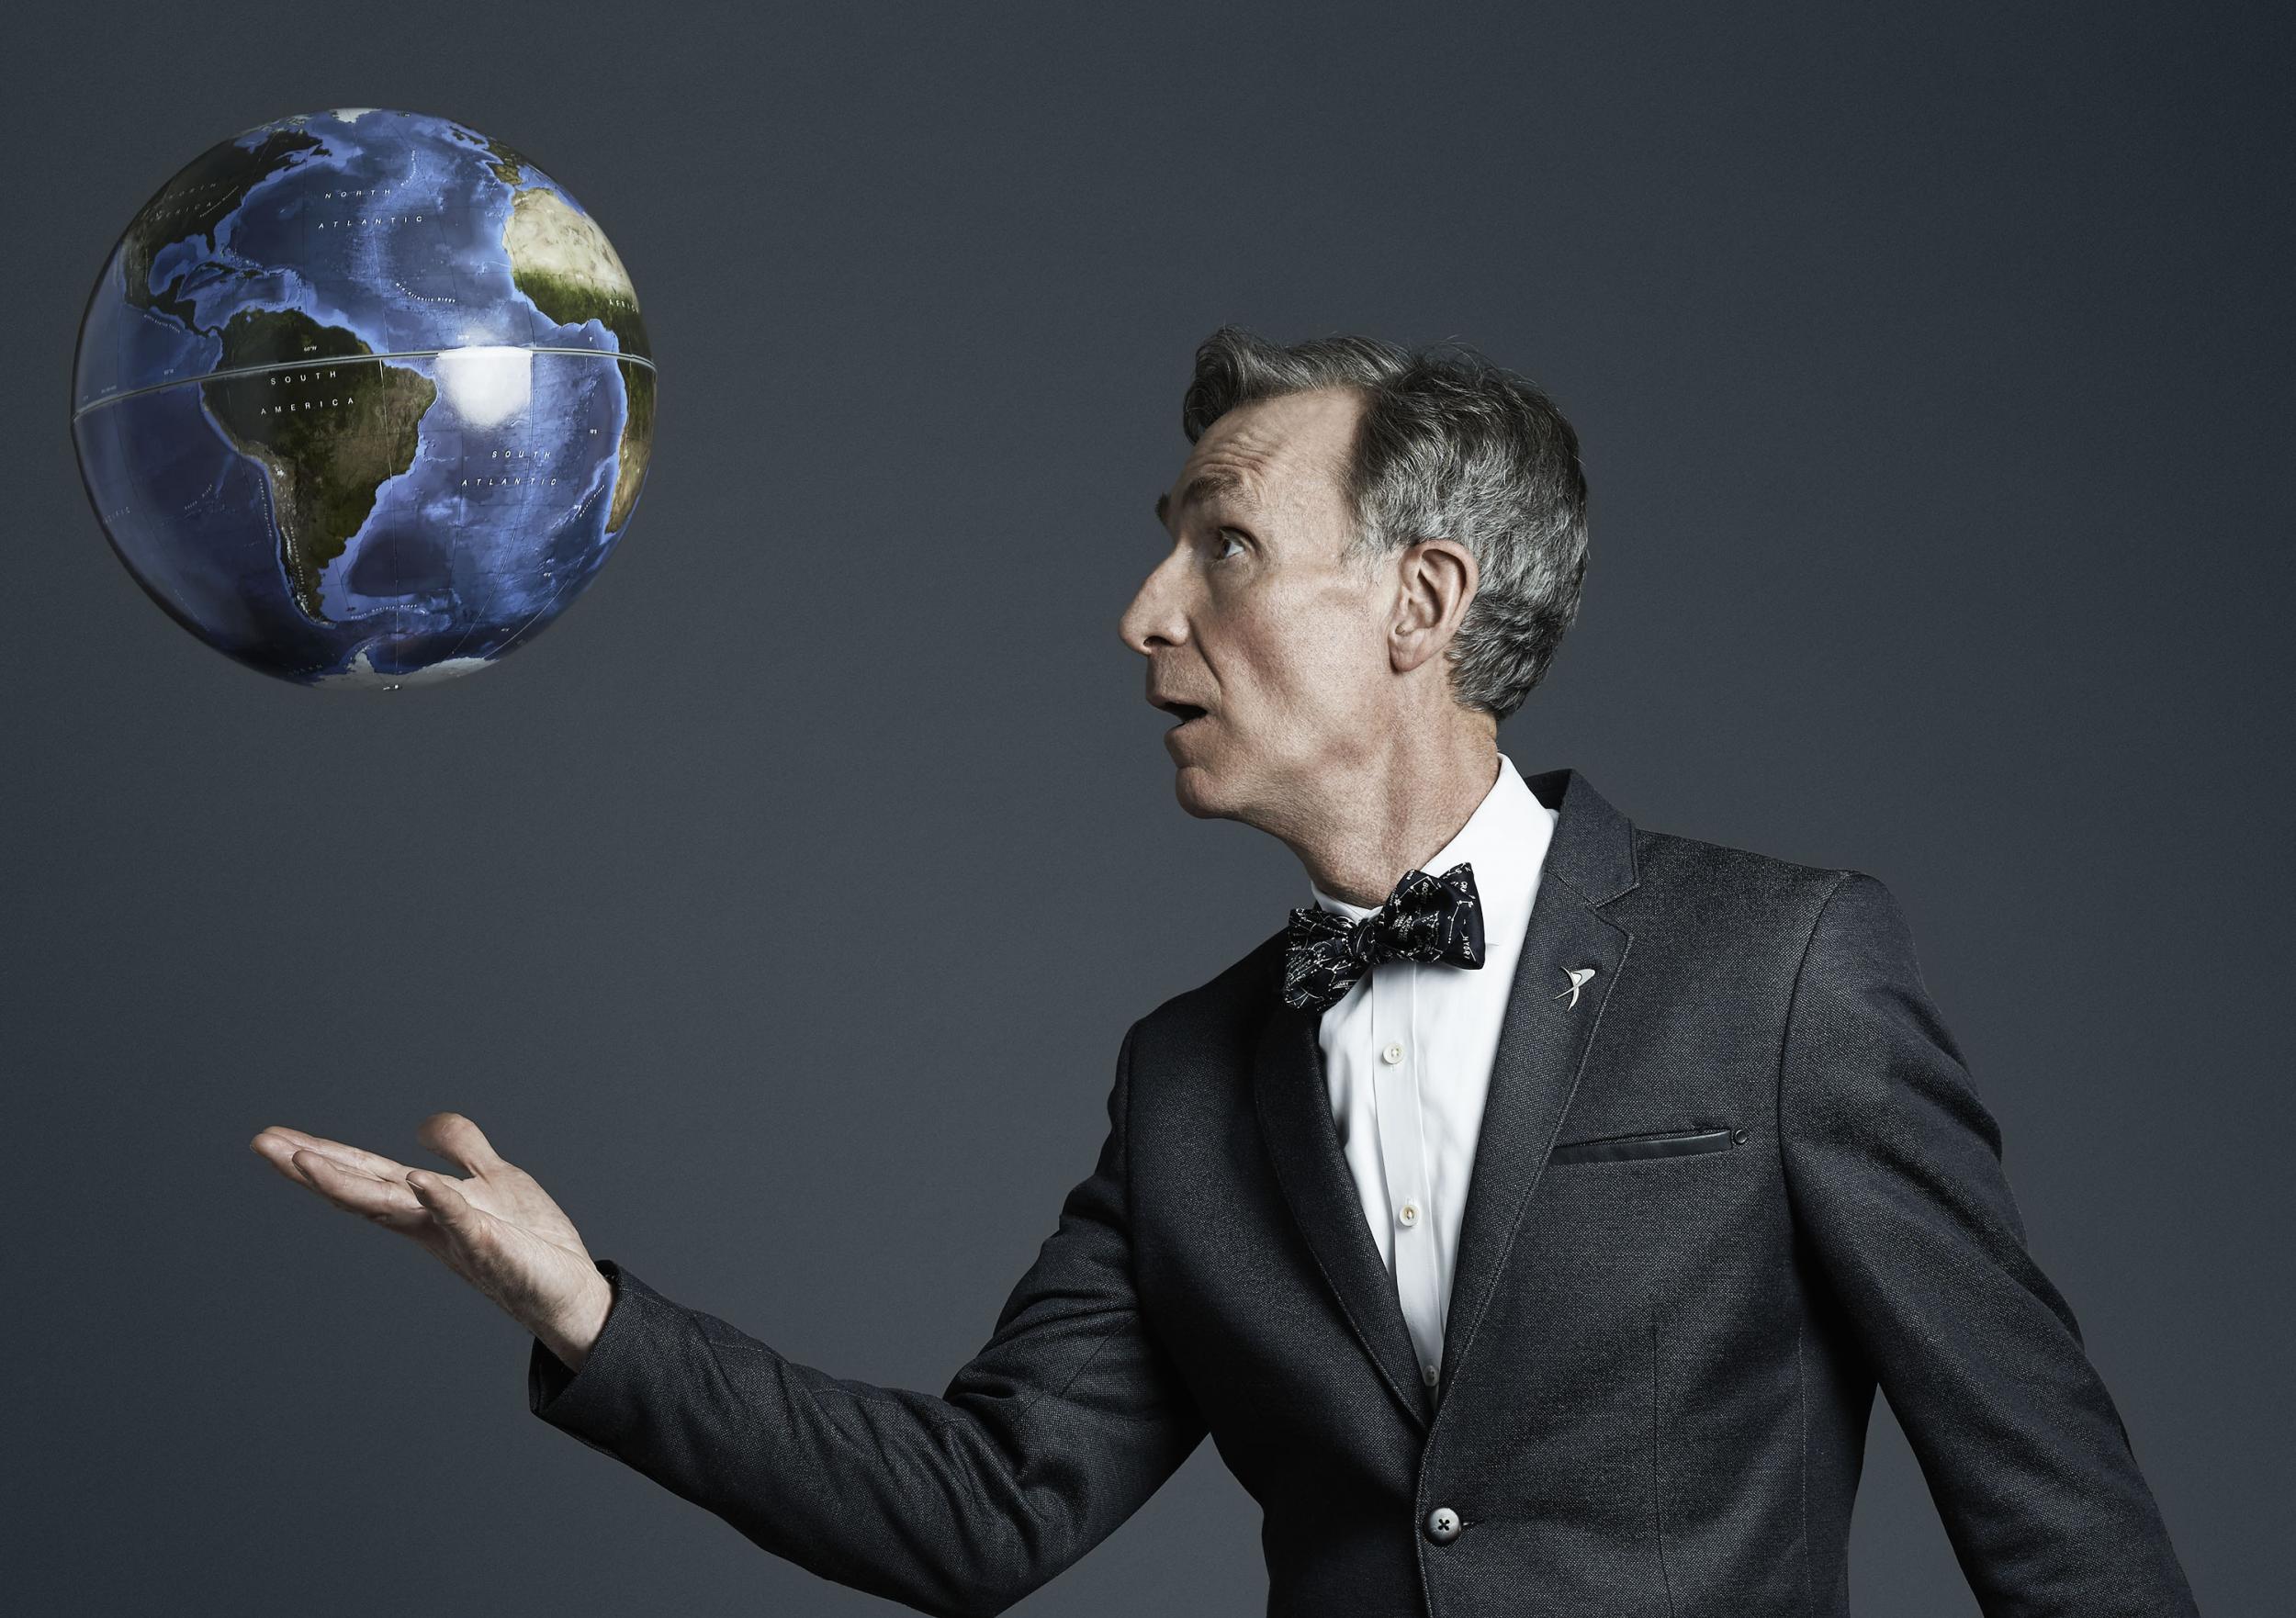 7-19-17 Bill Nye 2